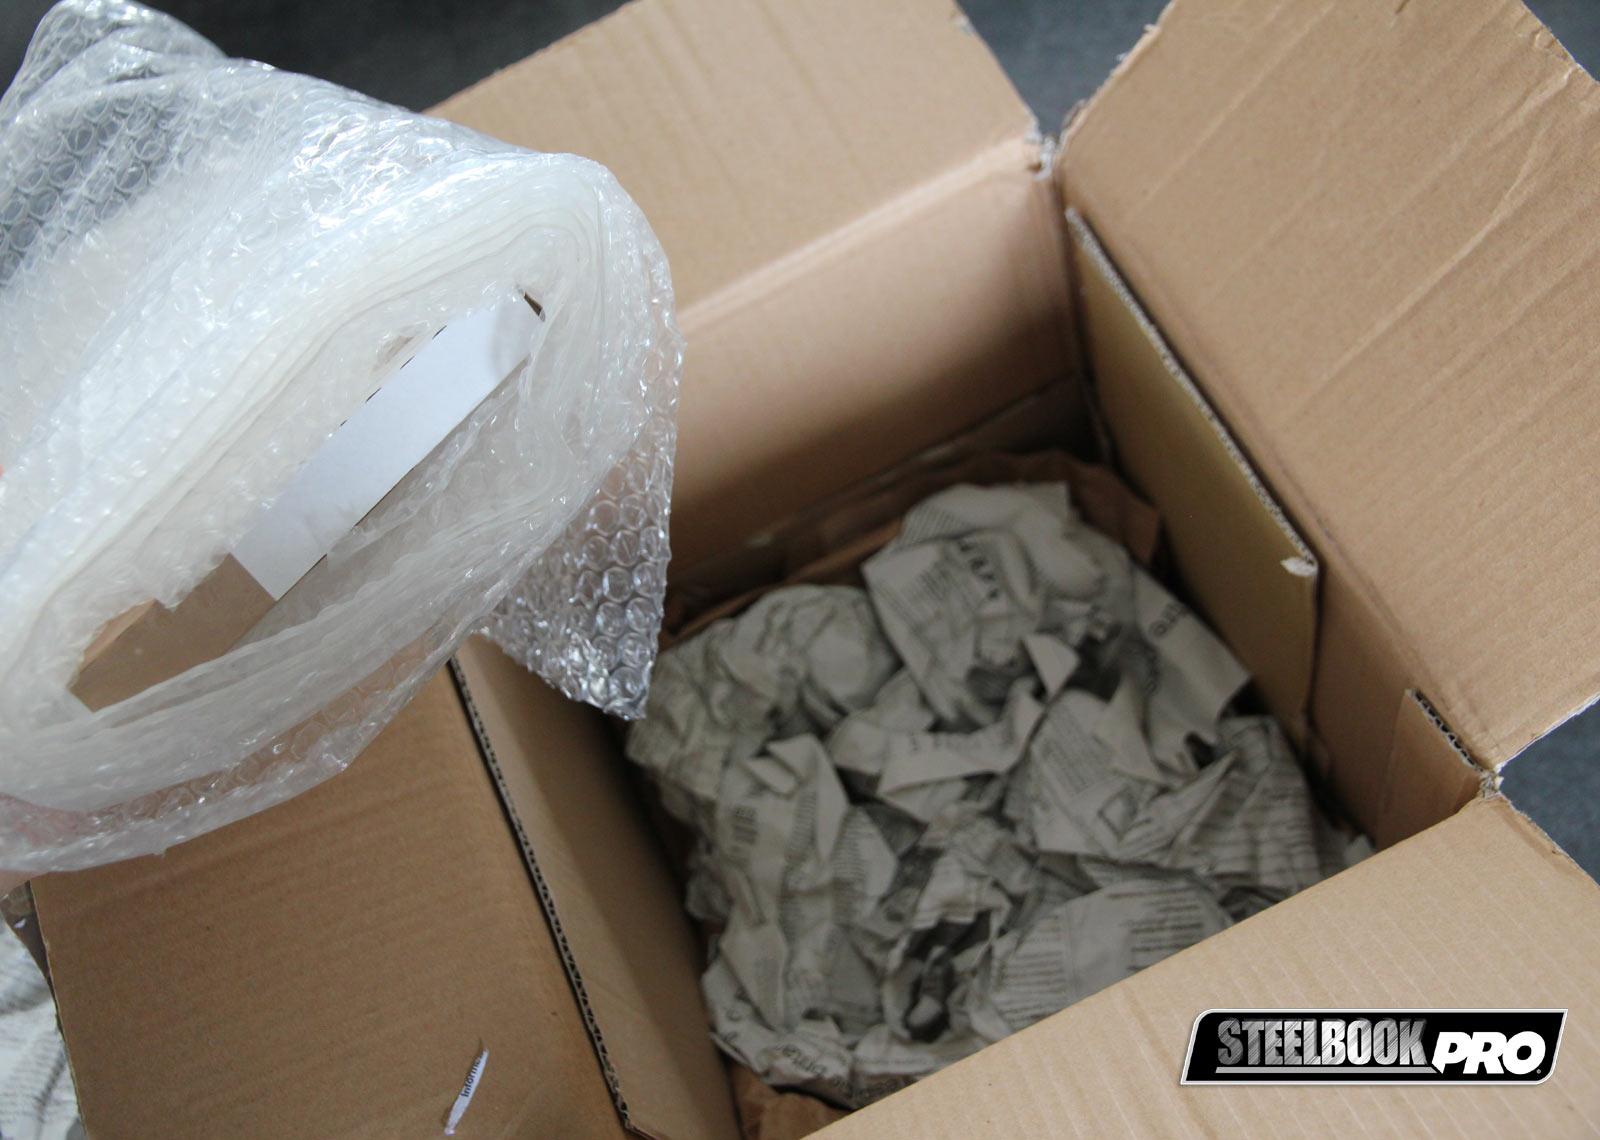 Best-colis-steelbook-5